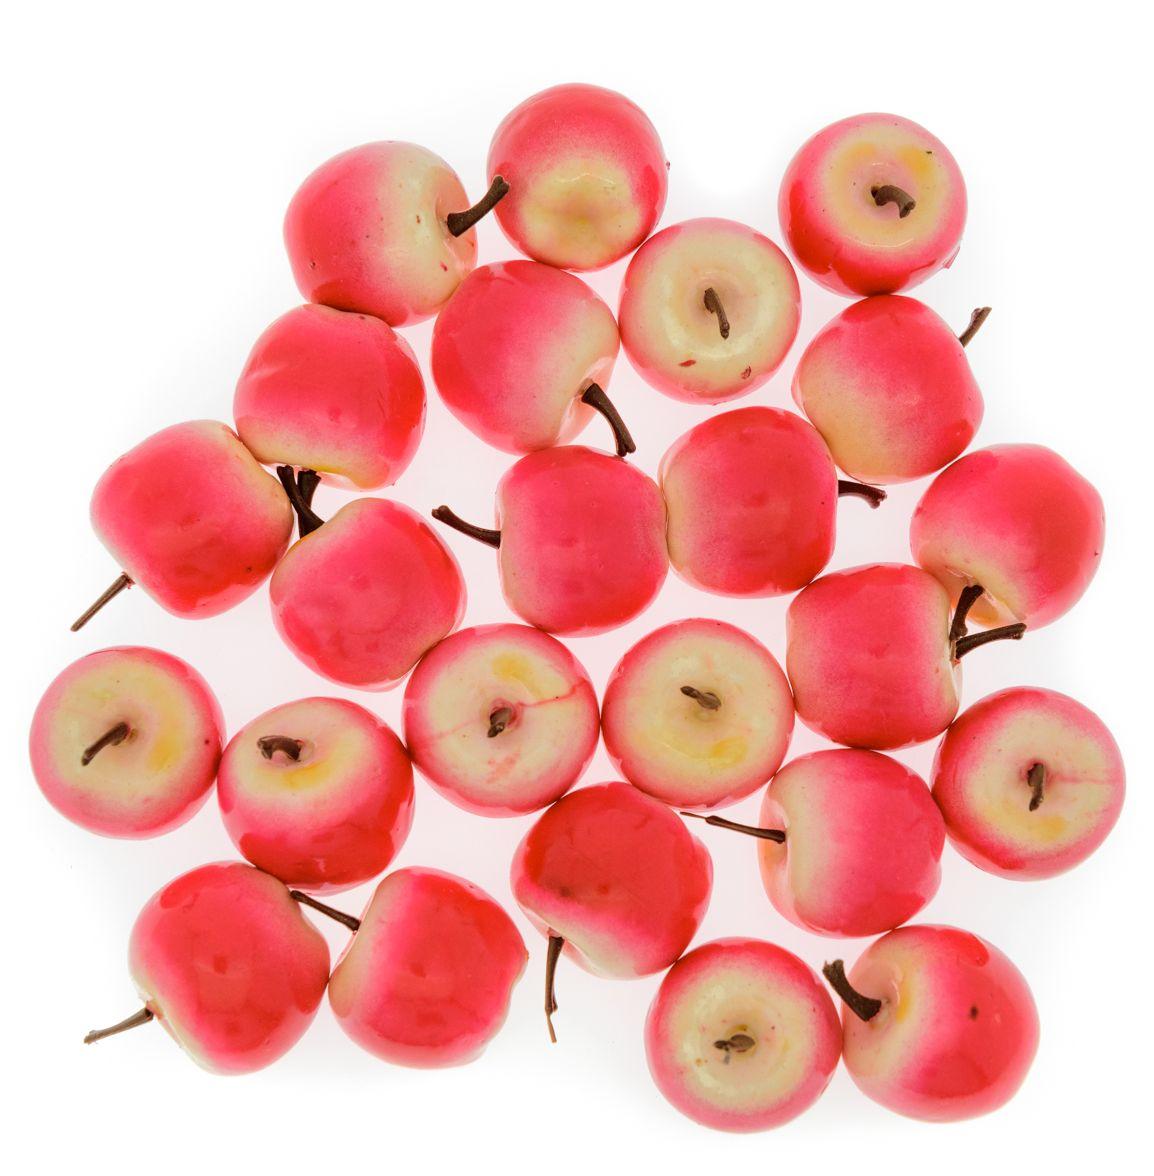 Счетный материал АНДАНТЕ Яблочки, 24 элемента